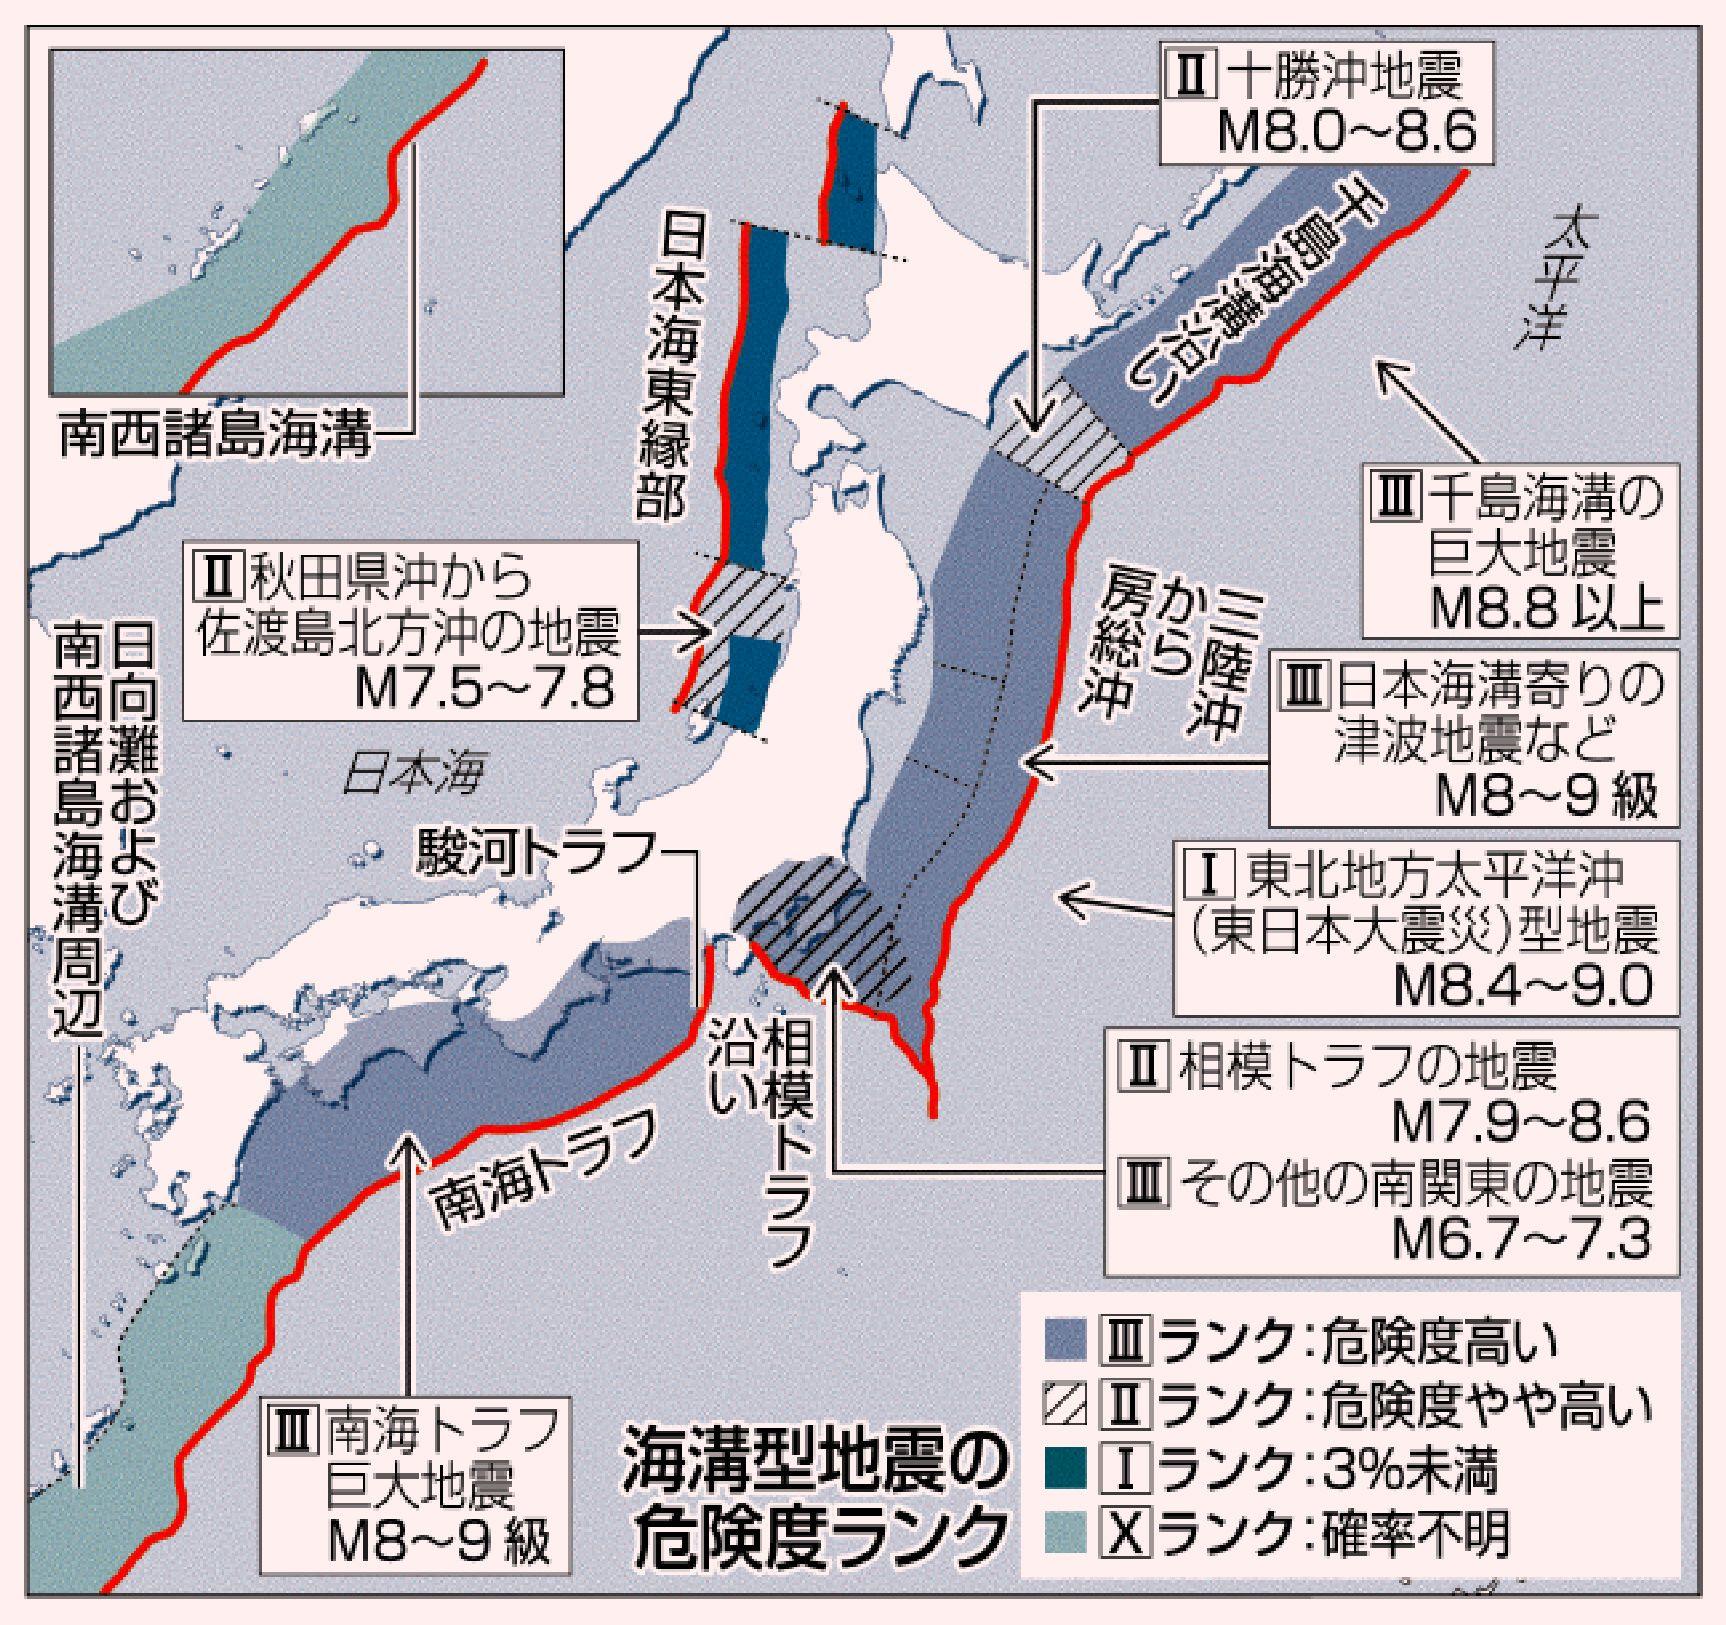 地震 確率 トラフ 南海